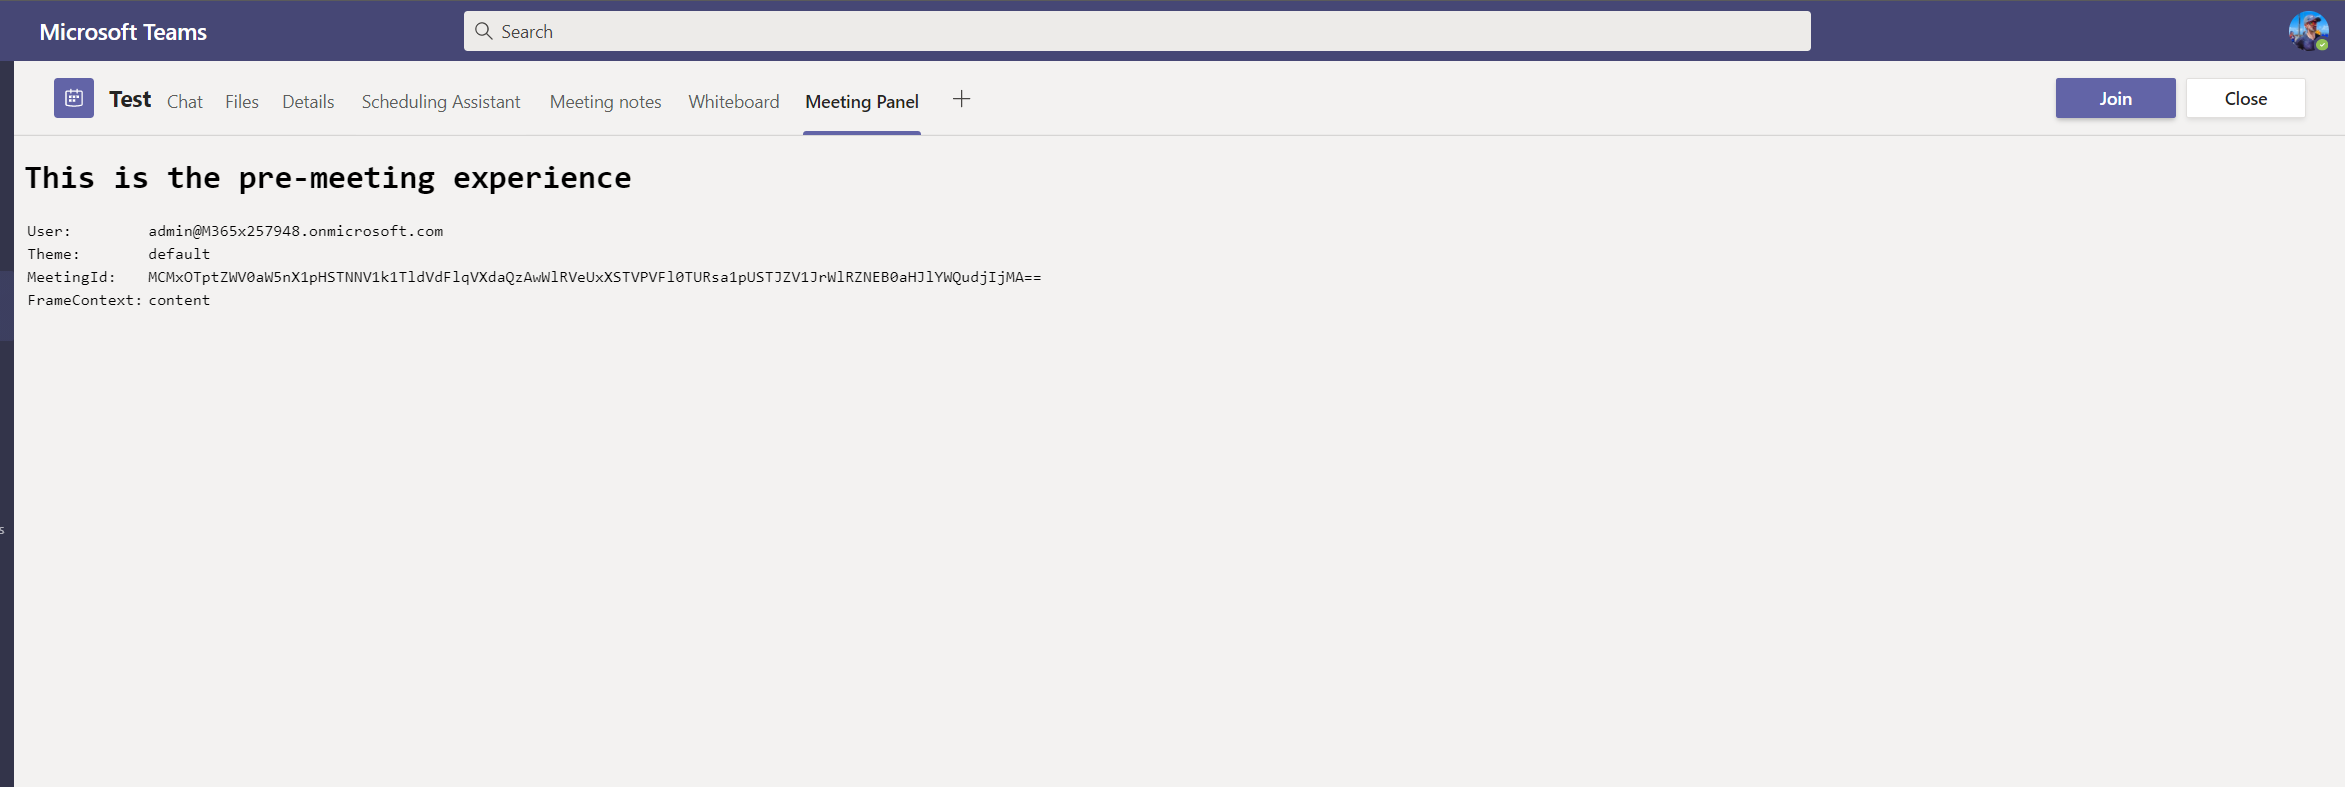 Screenshot 2021-02-23 170858